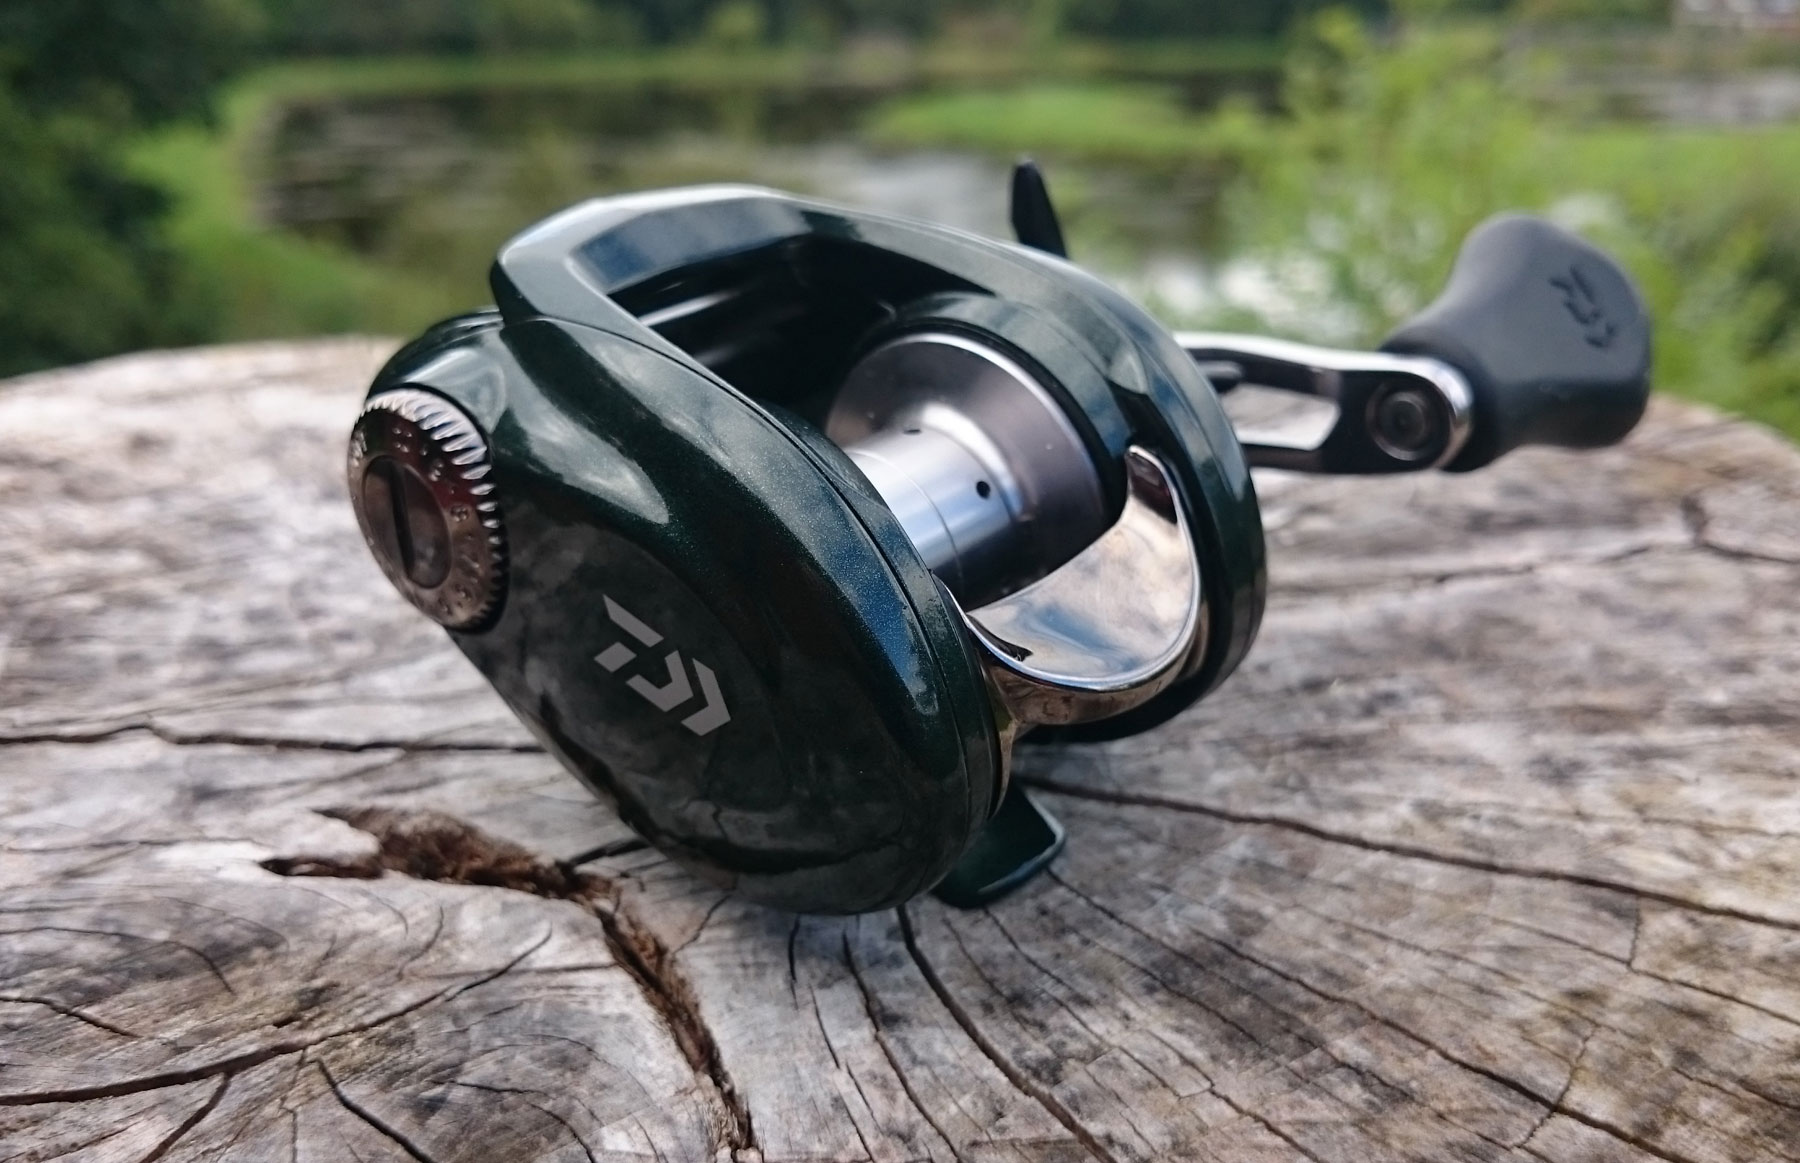 Ex display daiwa laguna baitcaster fishing reel rhw model for Fishing reels baitcaster